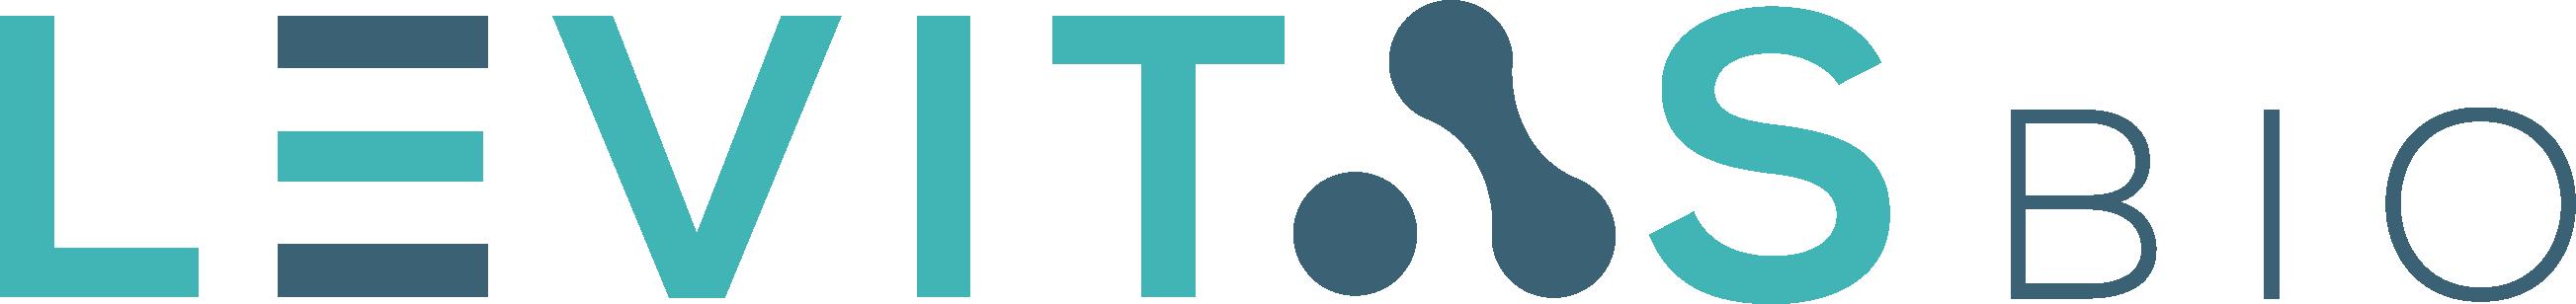 LevitasBio logo